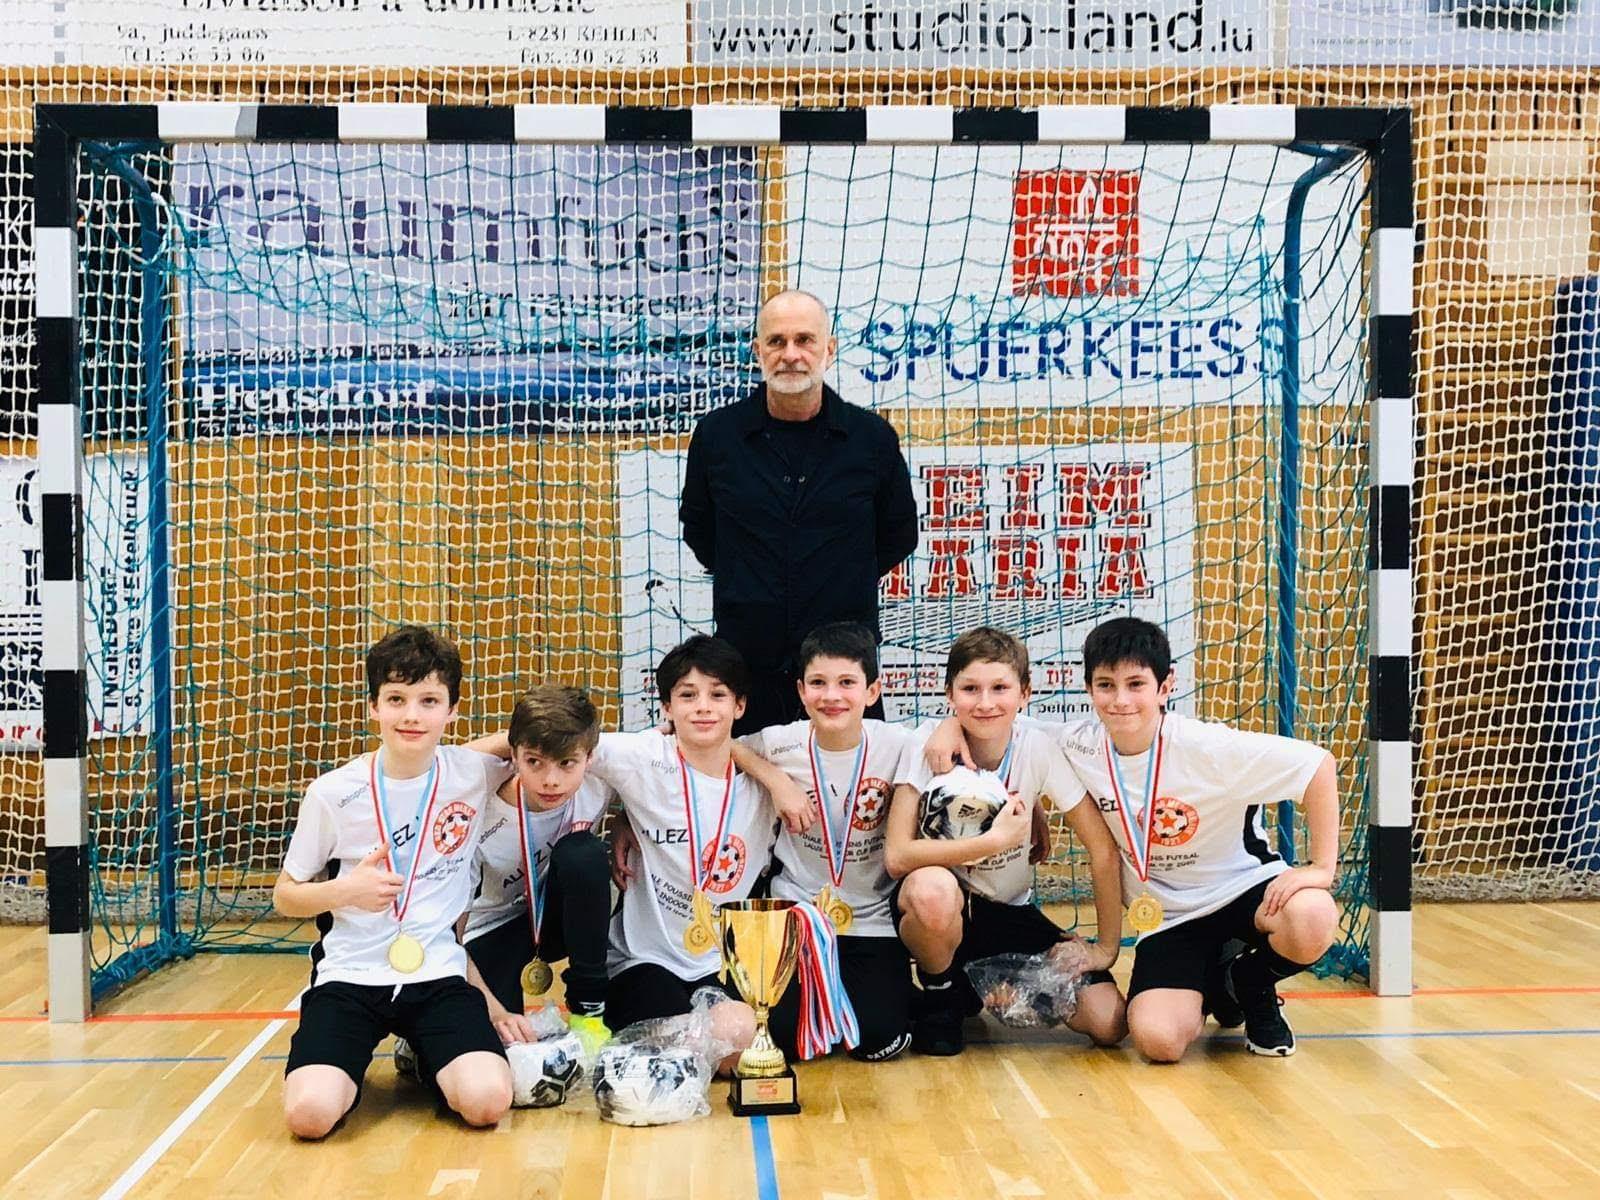 Equipe POUSSIN FC RED STAR MERL BELAIR gagne championnat FUTSAL